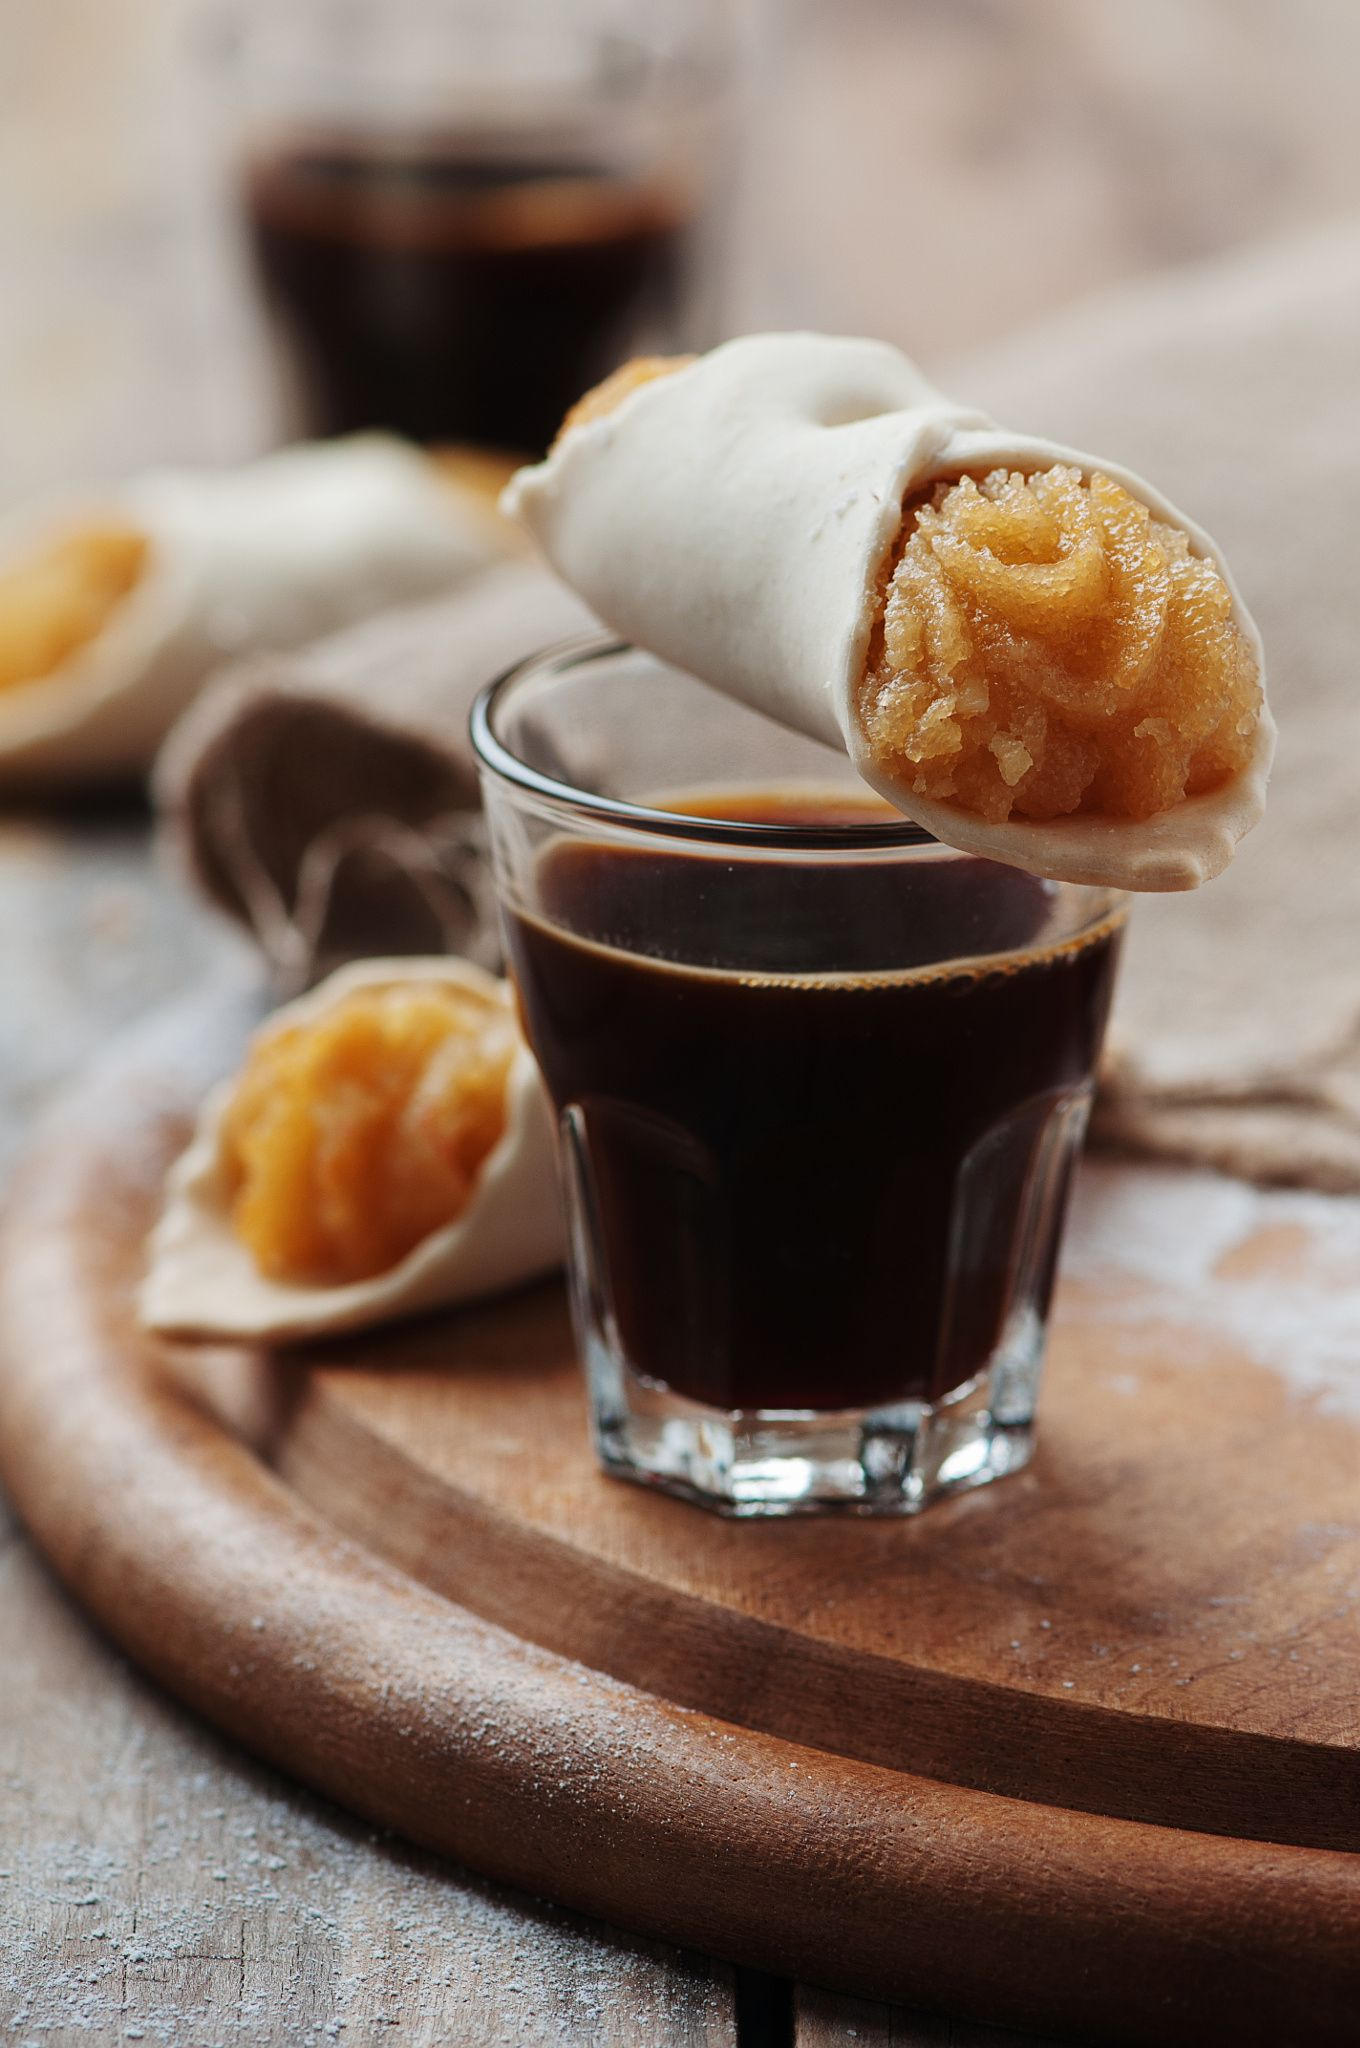 Traditional italian cookie with coffee by Oxana Denezhkina